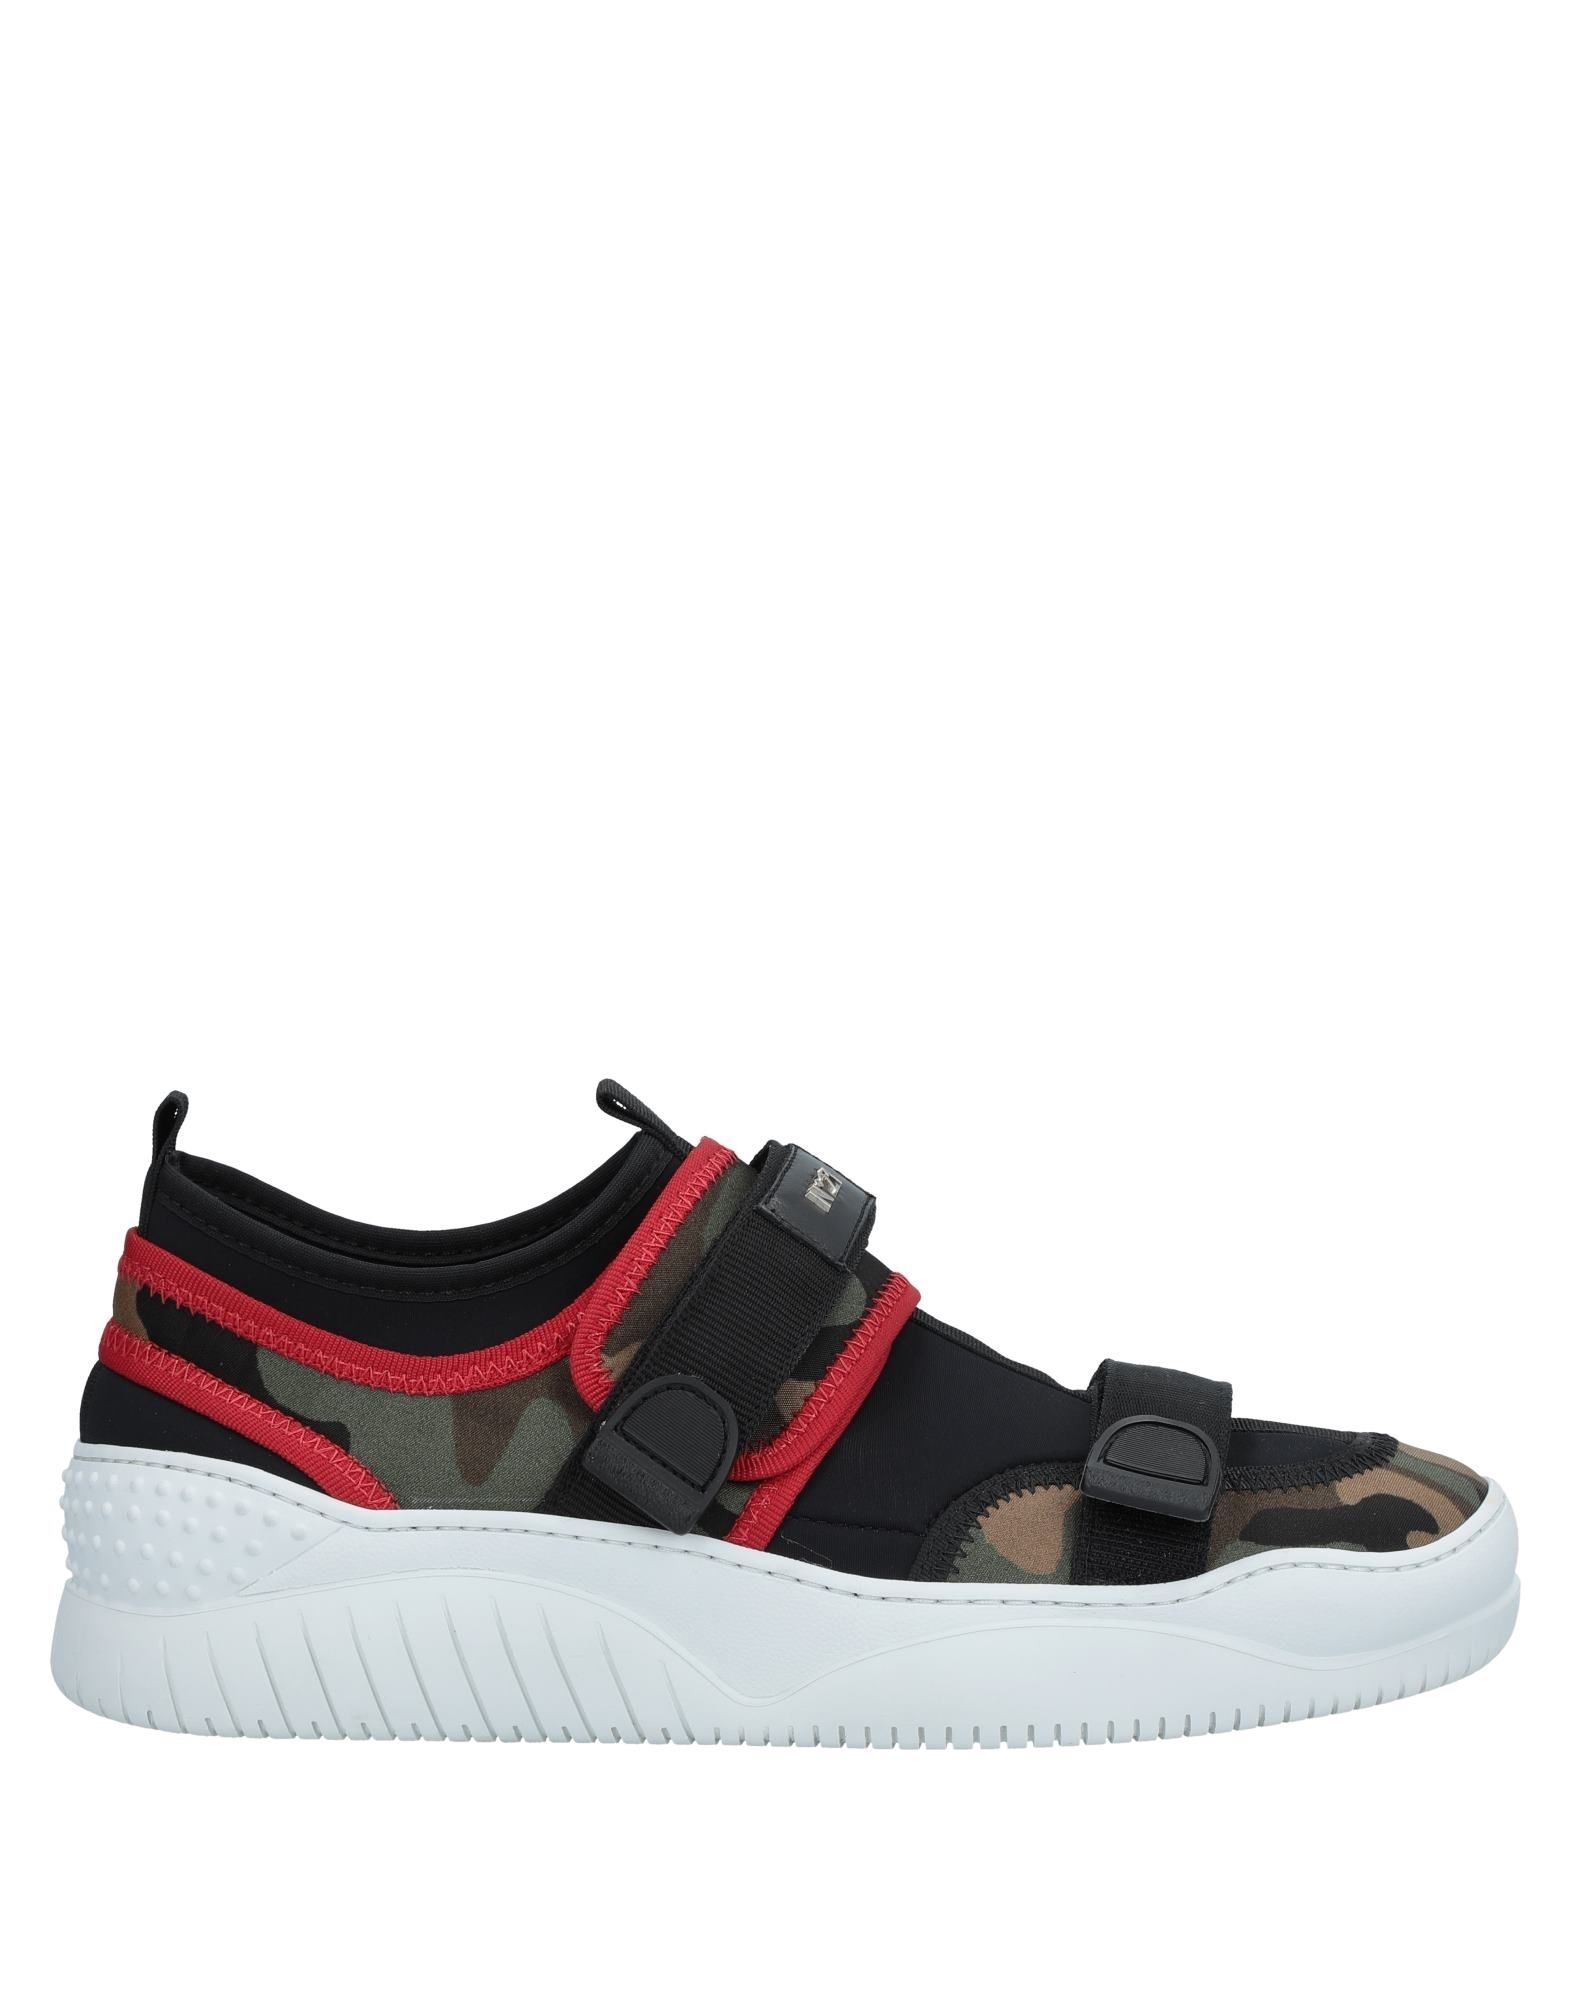 N° 21 Sneakers Herren  11533380TF Gute Qualität beliebte Schuhe